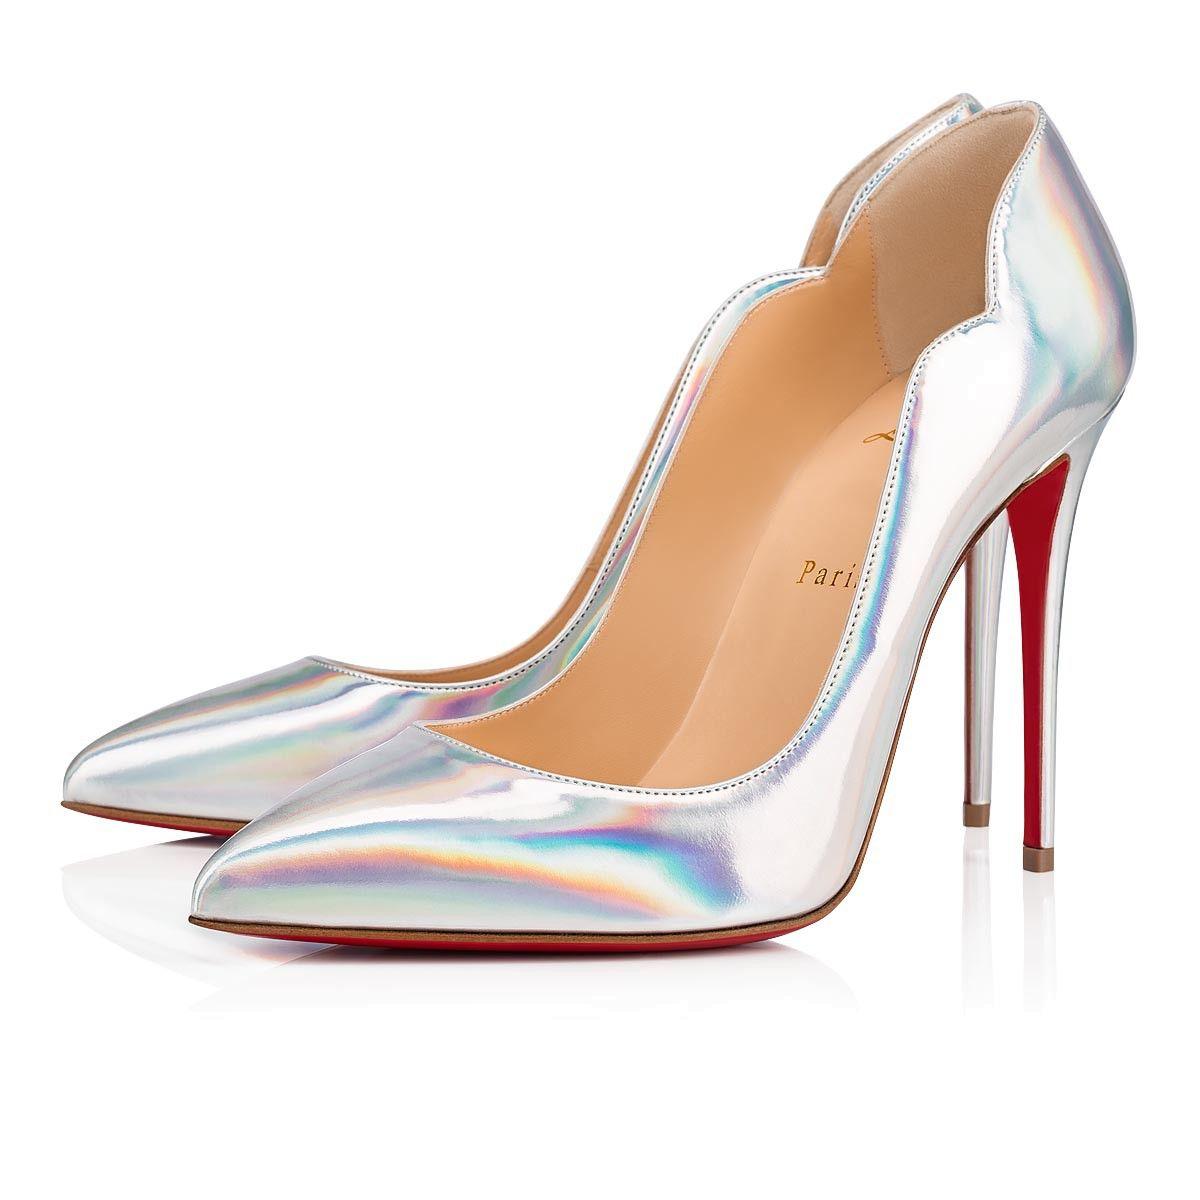 d62eef882e3 Hot Chick 100 Silver Specchio - Women Shoes - Christian Louboutin in ...